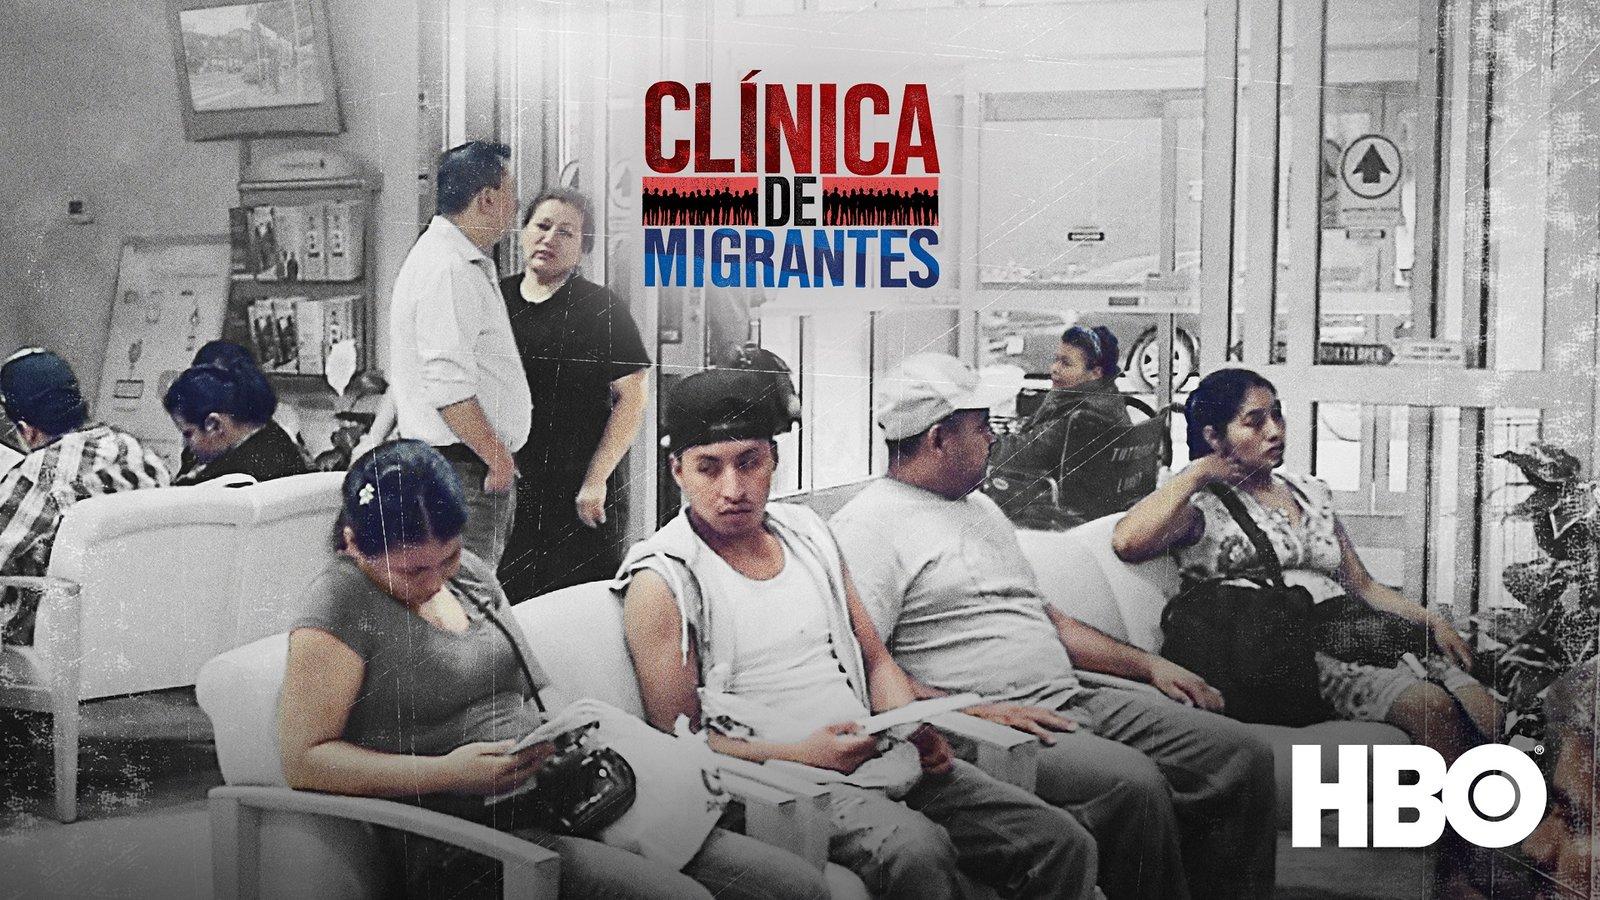 Clinica De Migrantes - A Volunteer-Run Health Clinic Treating Undocumented and Uninsured Immigrants